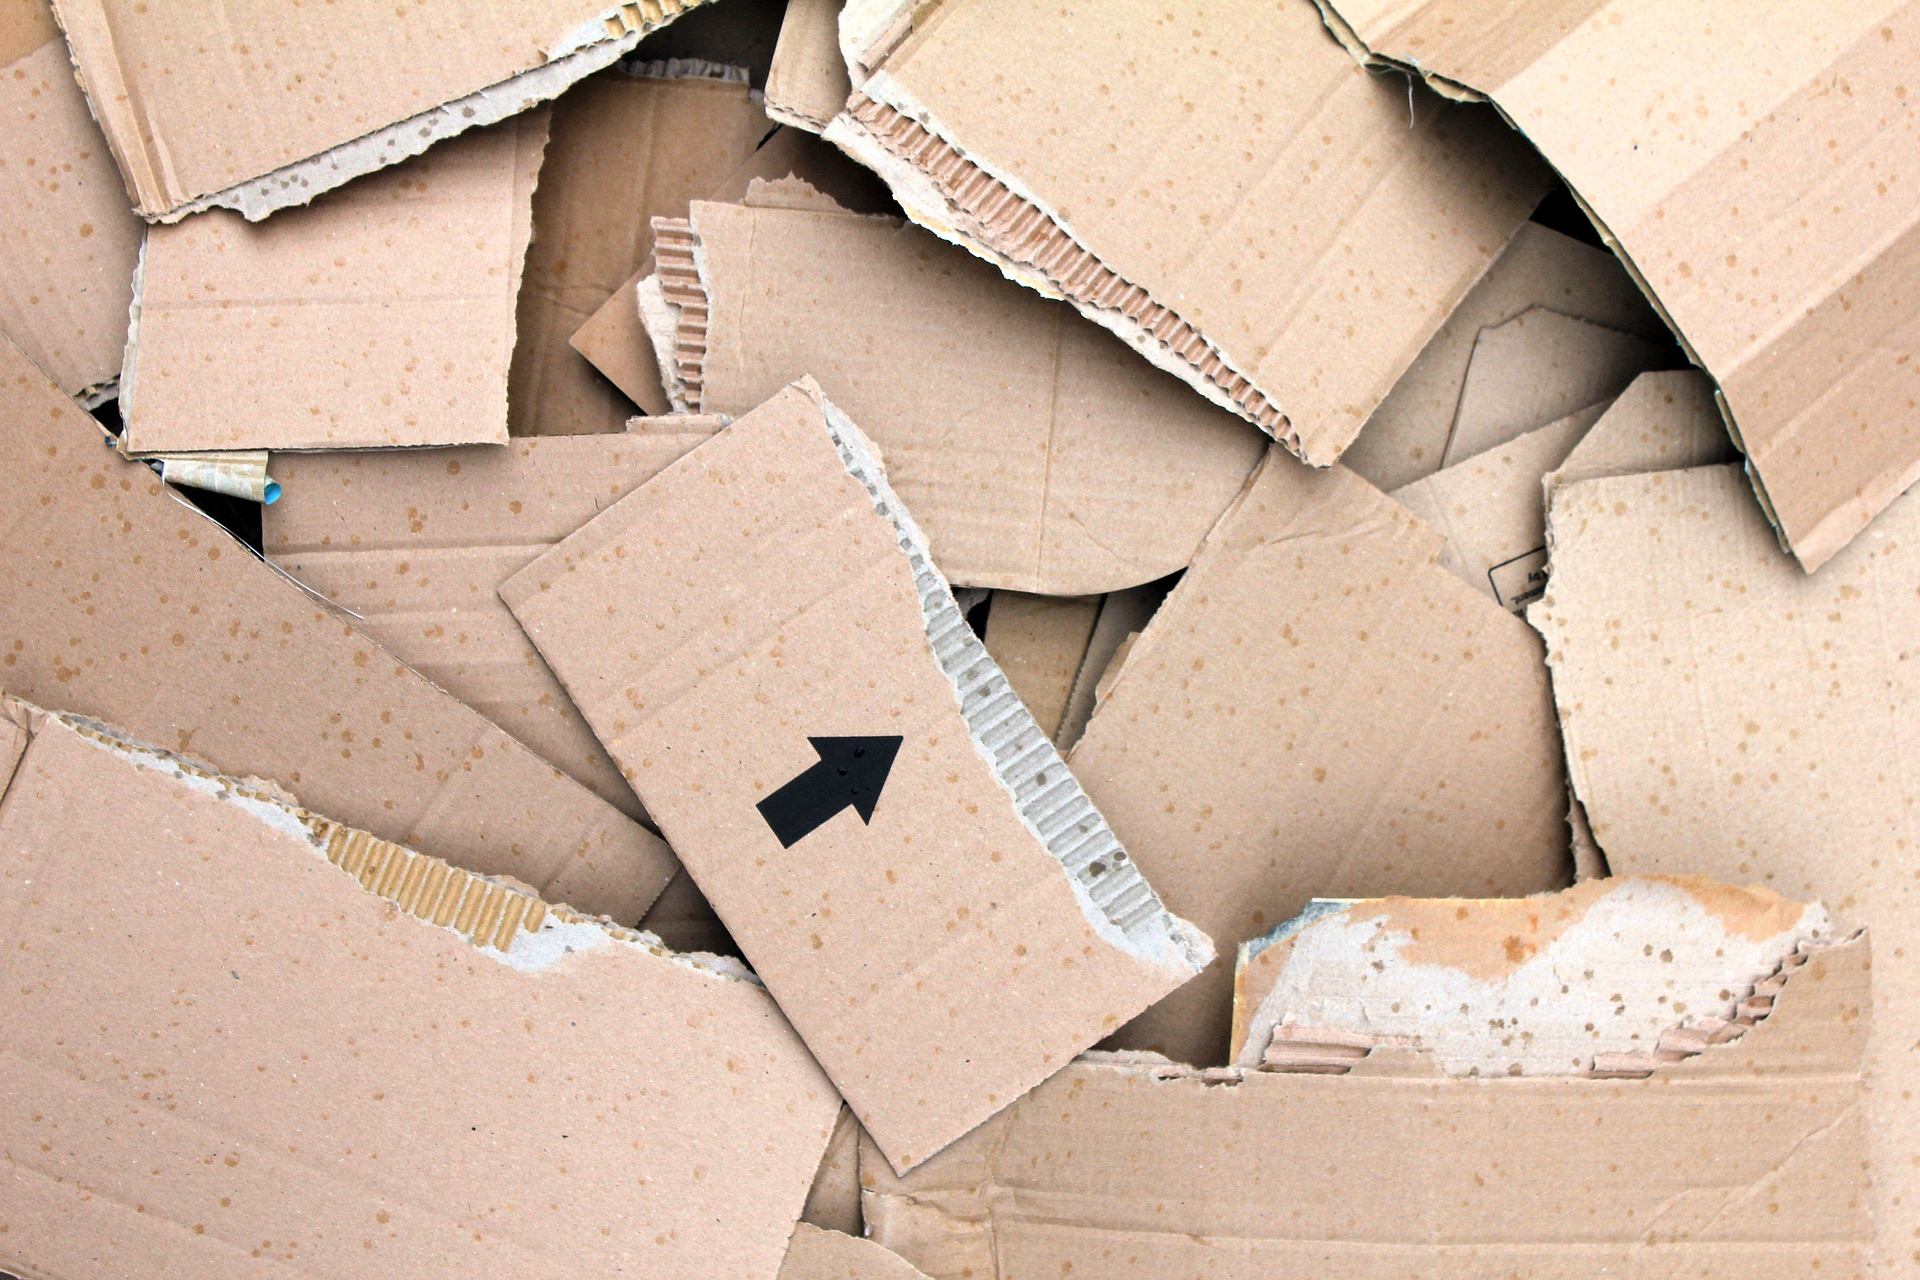 corrugated-cardboard-3853506_1920.jpg